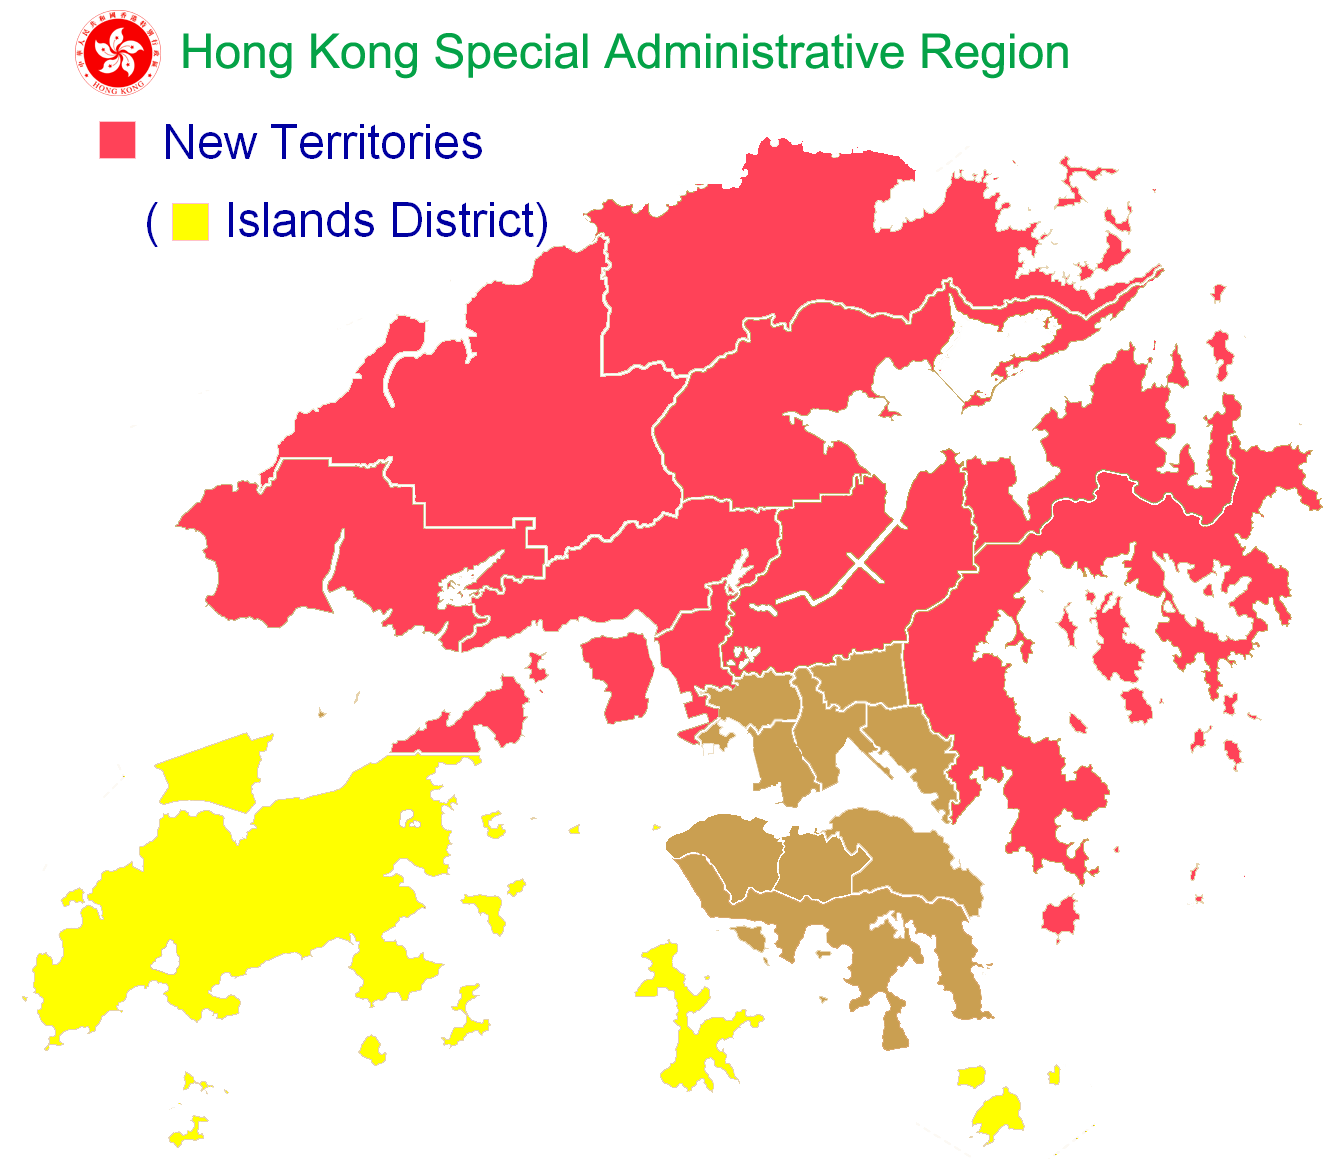 FileHong Kong New Territories including Islands DistrictPNG